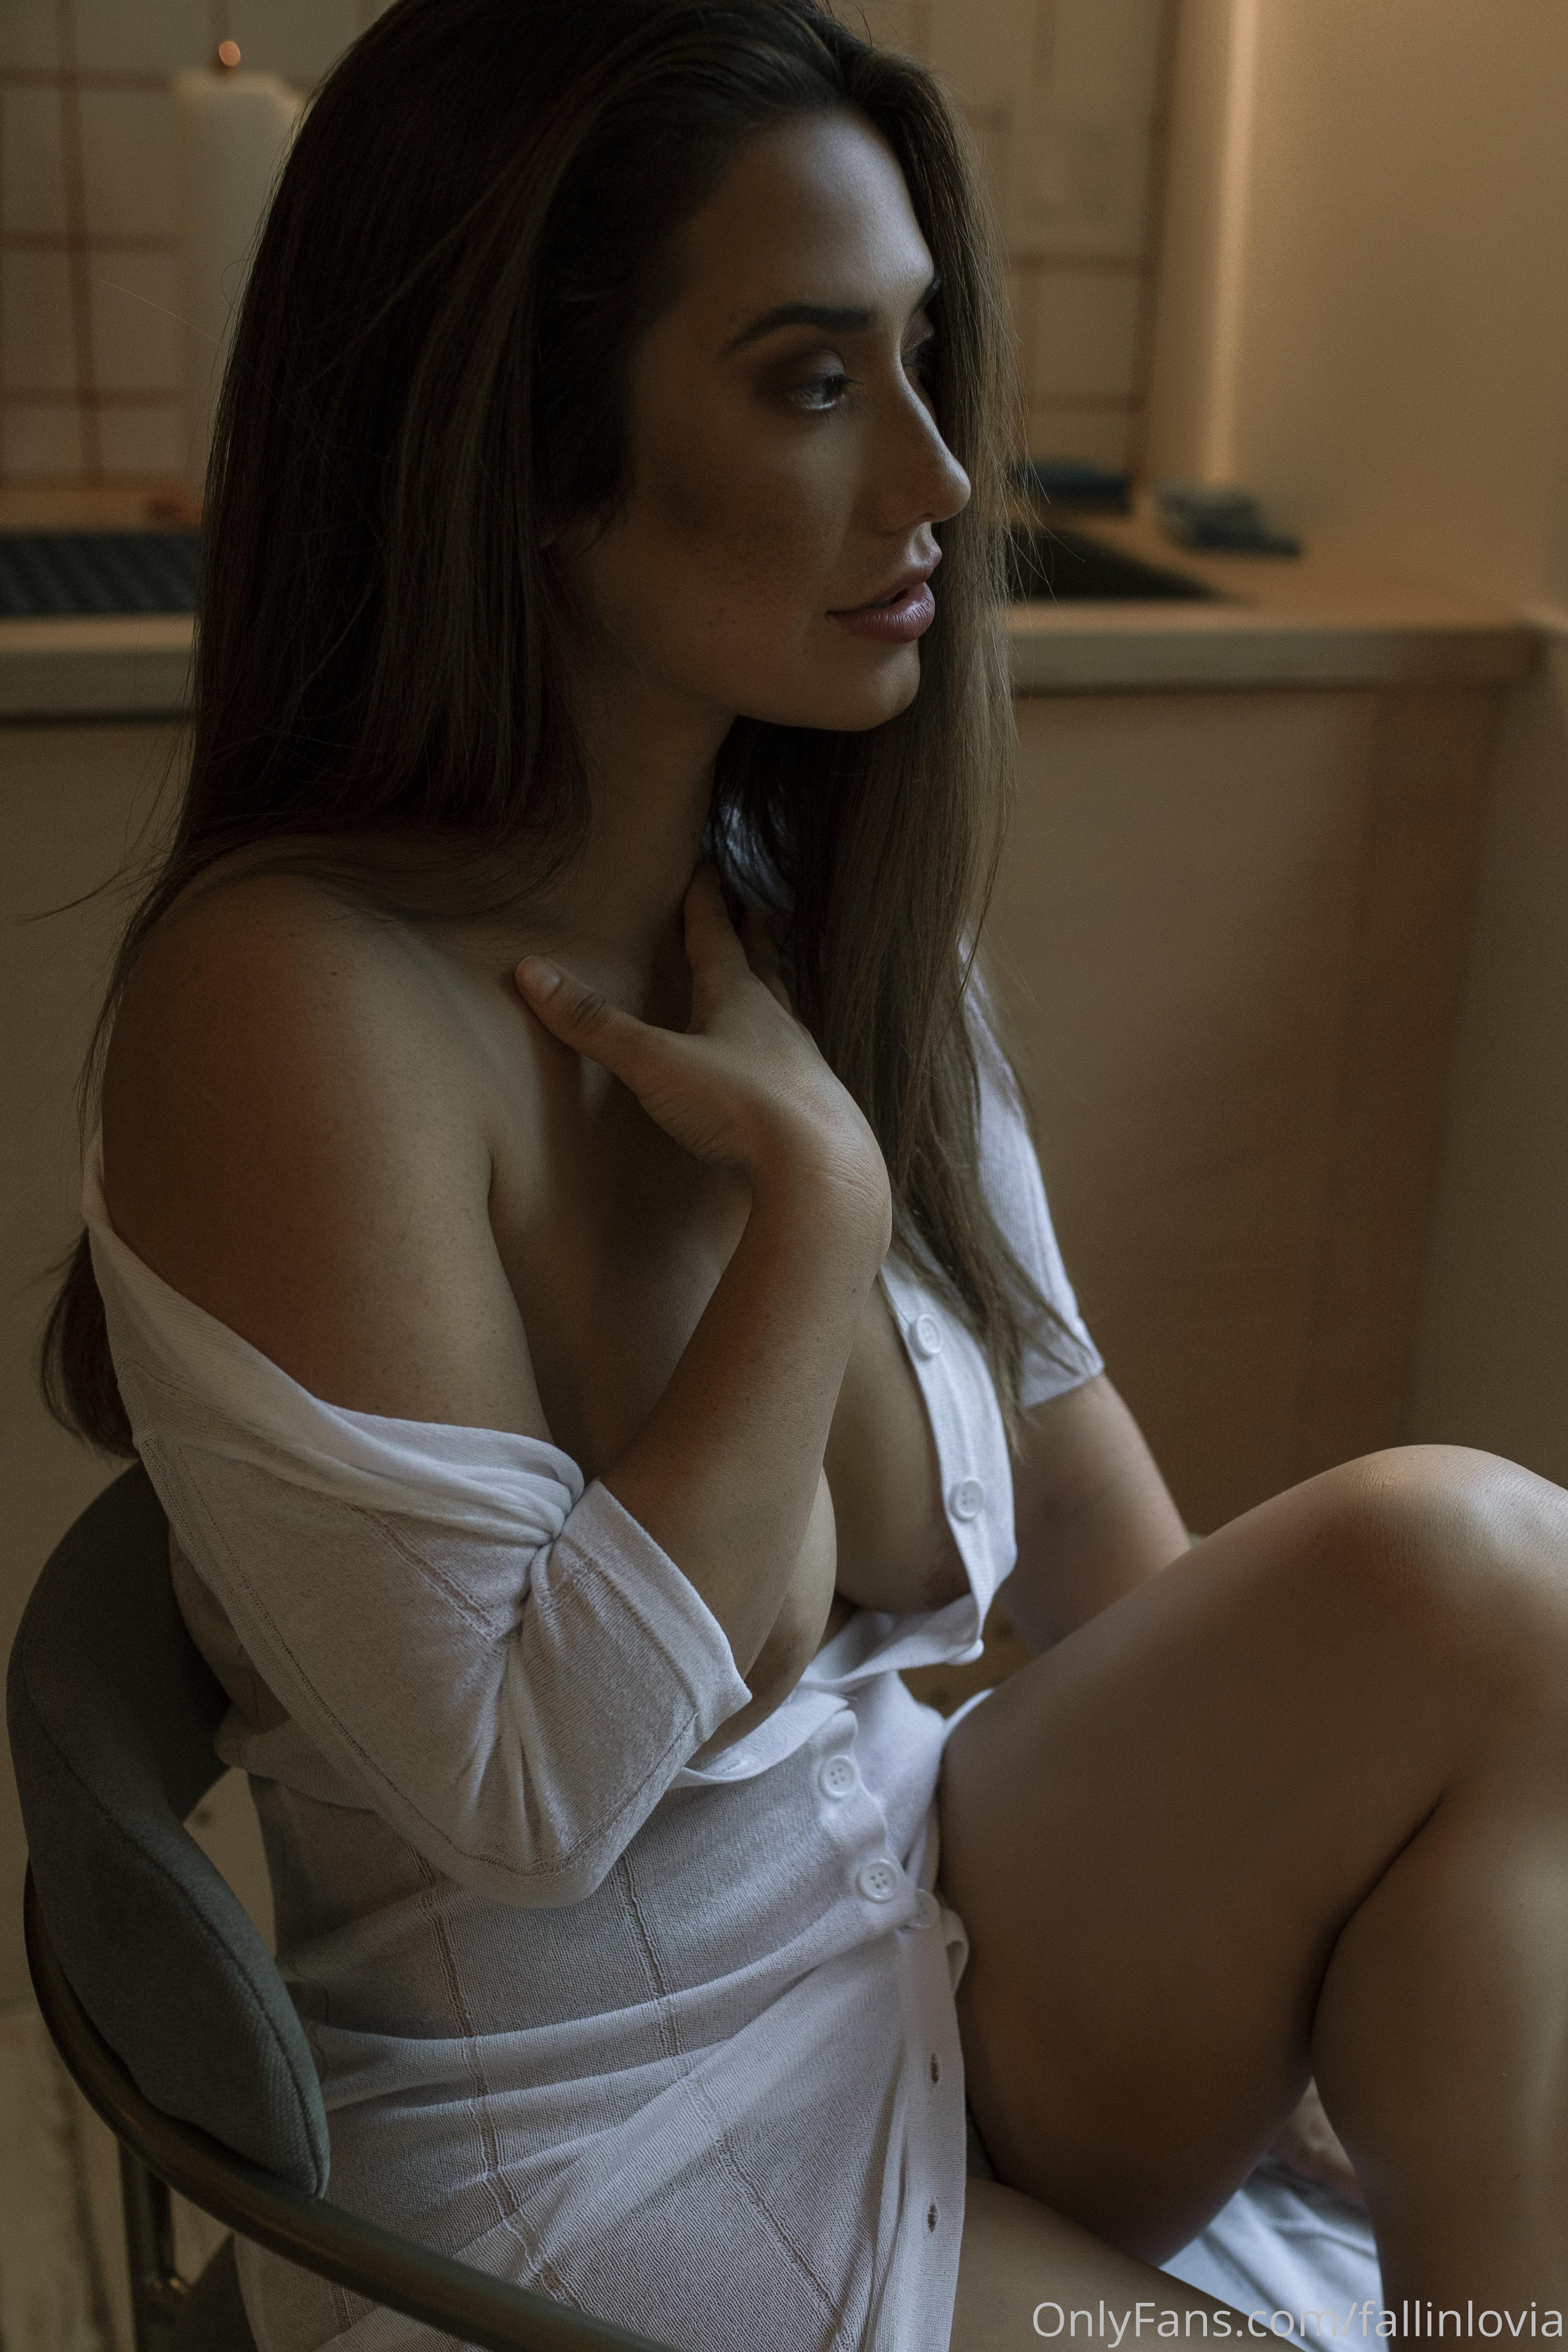 Eva Lovia, Fallinlovia, Onlyfans 0097